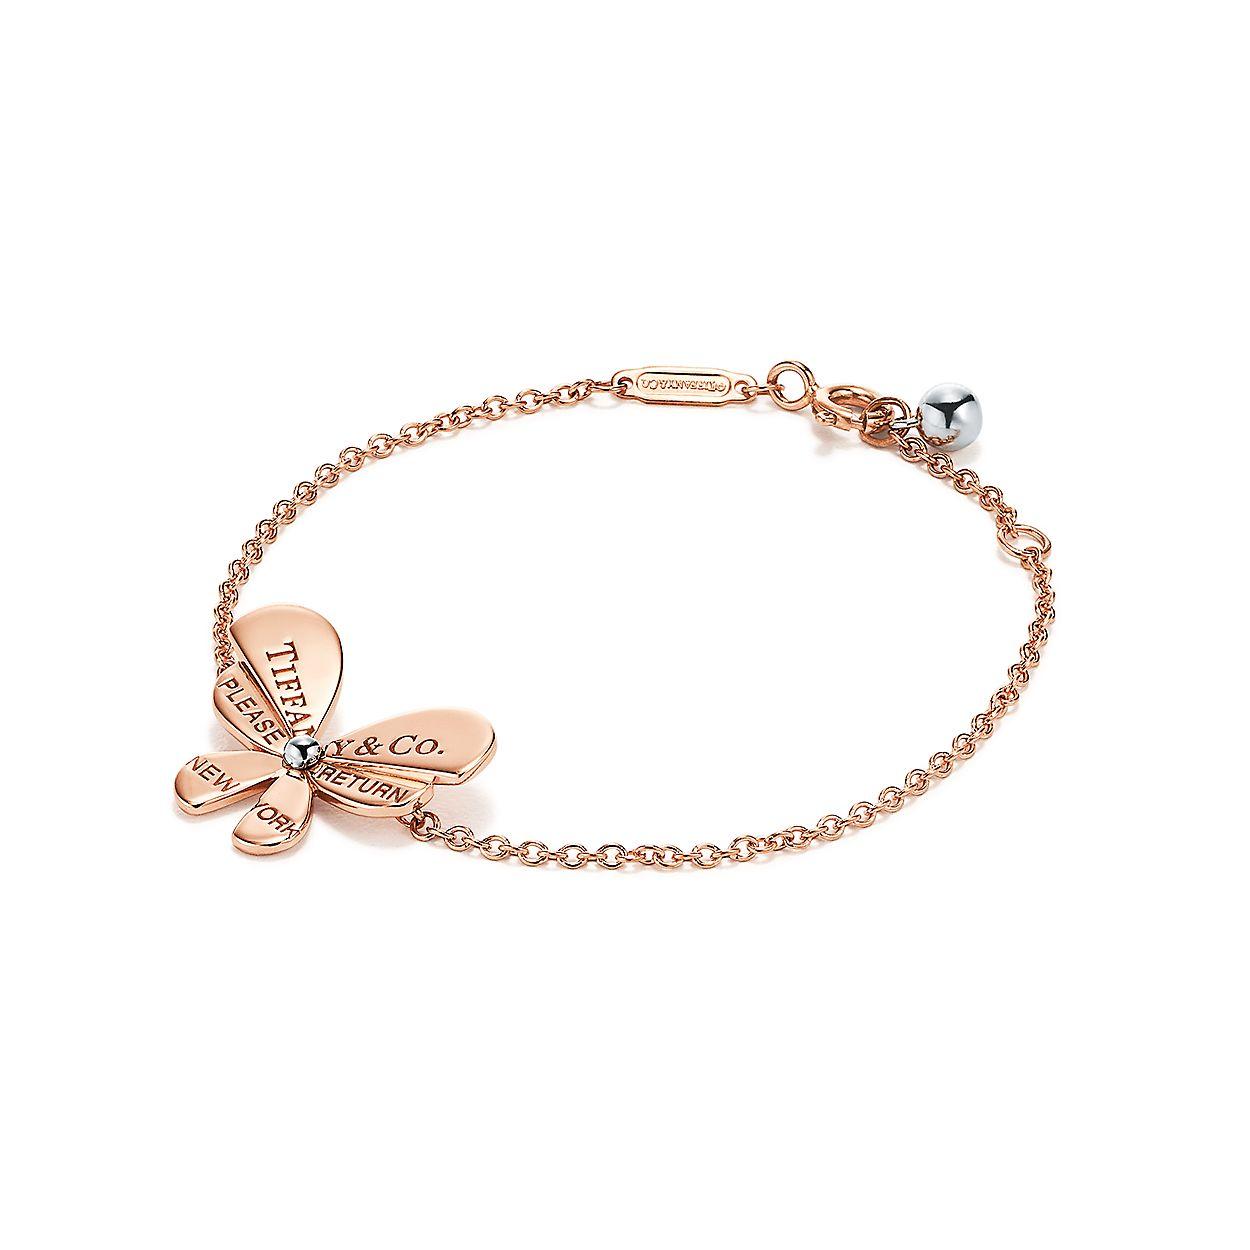 d8b6e7441 Tiffany Butterfly Charm Bracelet - Best Image Of Butterfly Imagevet.Co